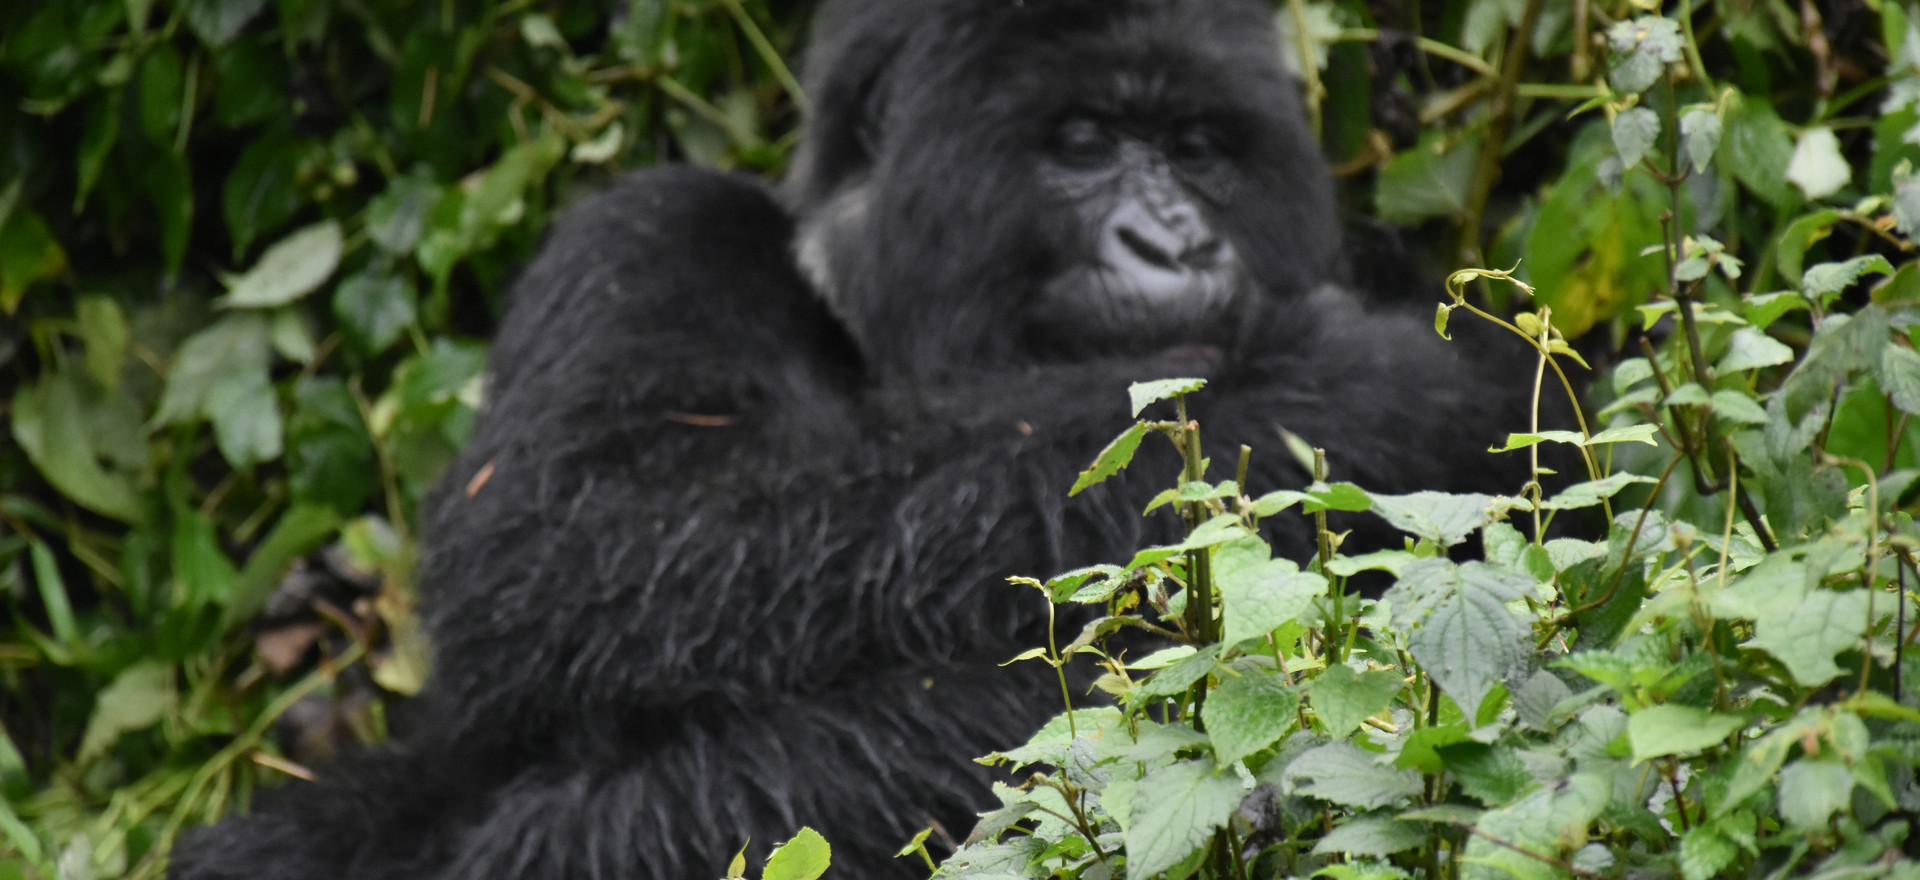 Rwanda, Volcanoes National Park Gorilla trek gorilla in the mist